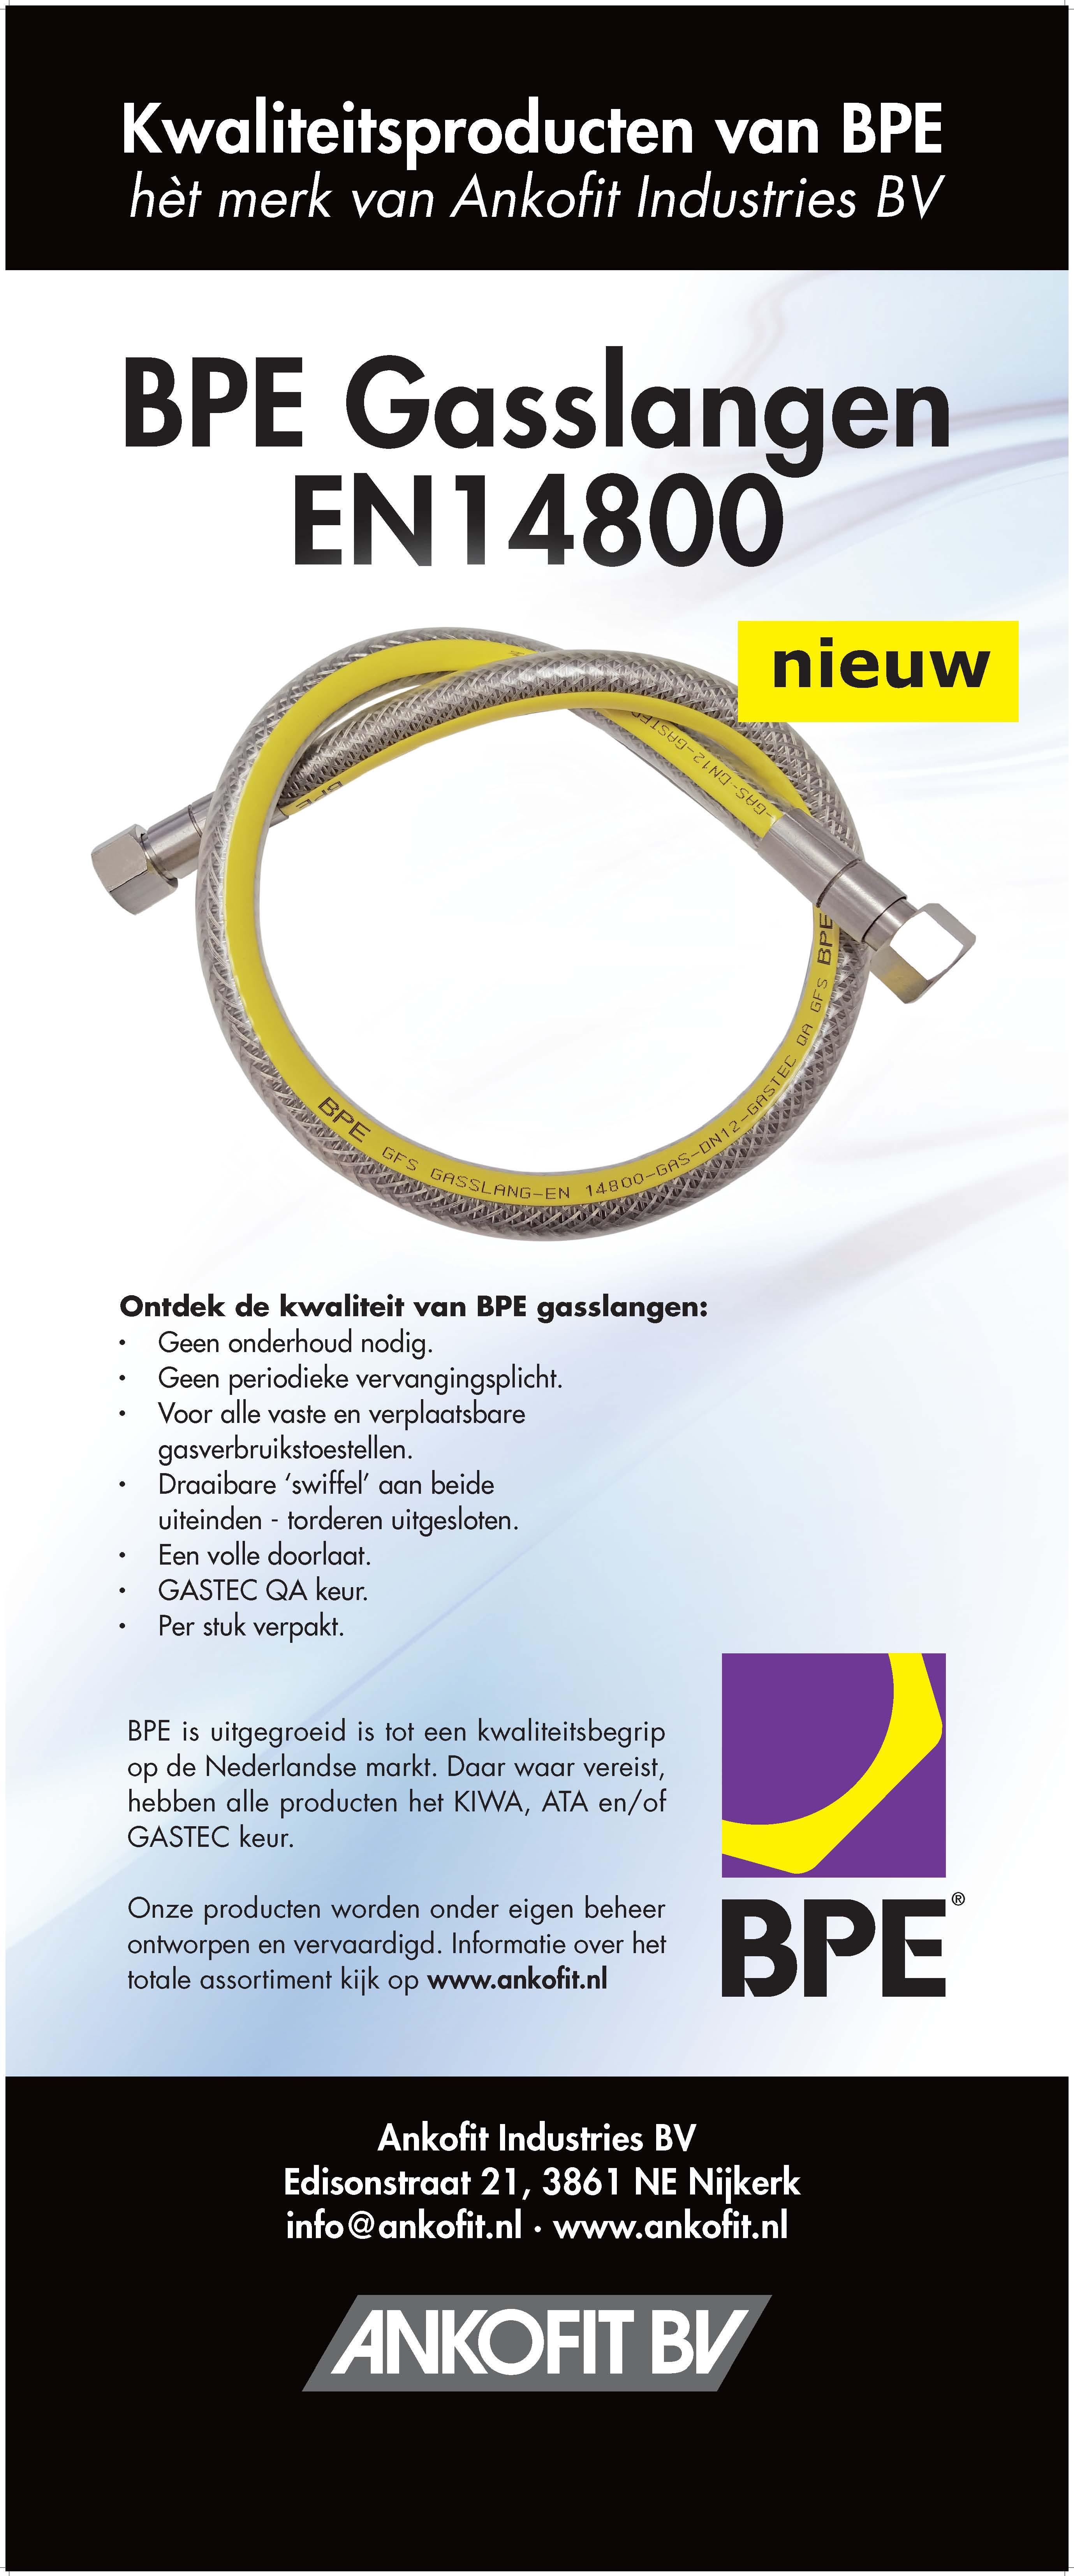 banier Gasslang 85 x 200 cm LR